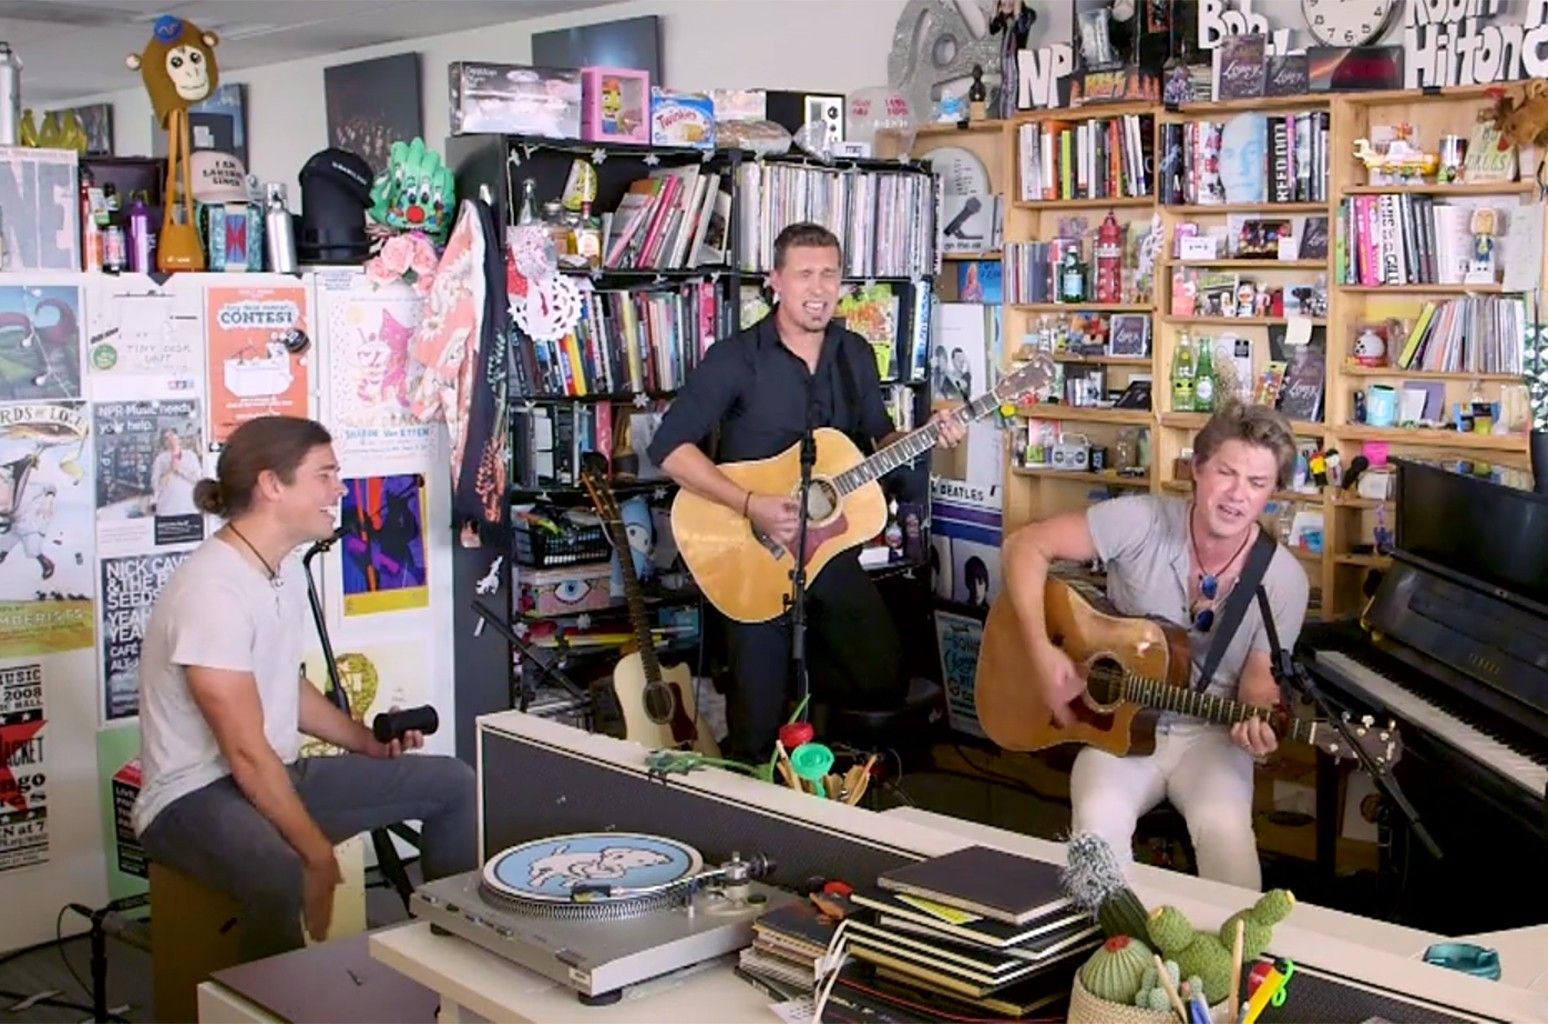 Hanson performs on NPR Music's Tiny Desk concert series.